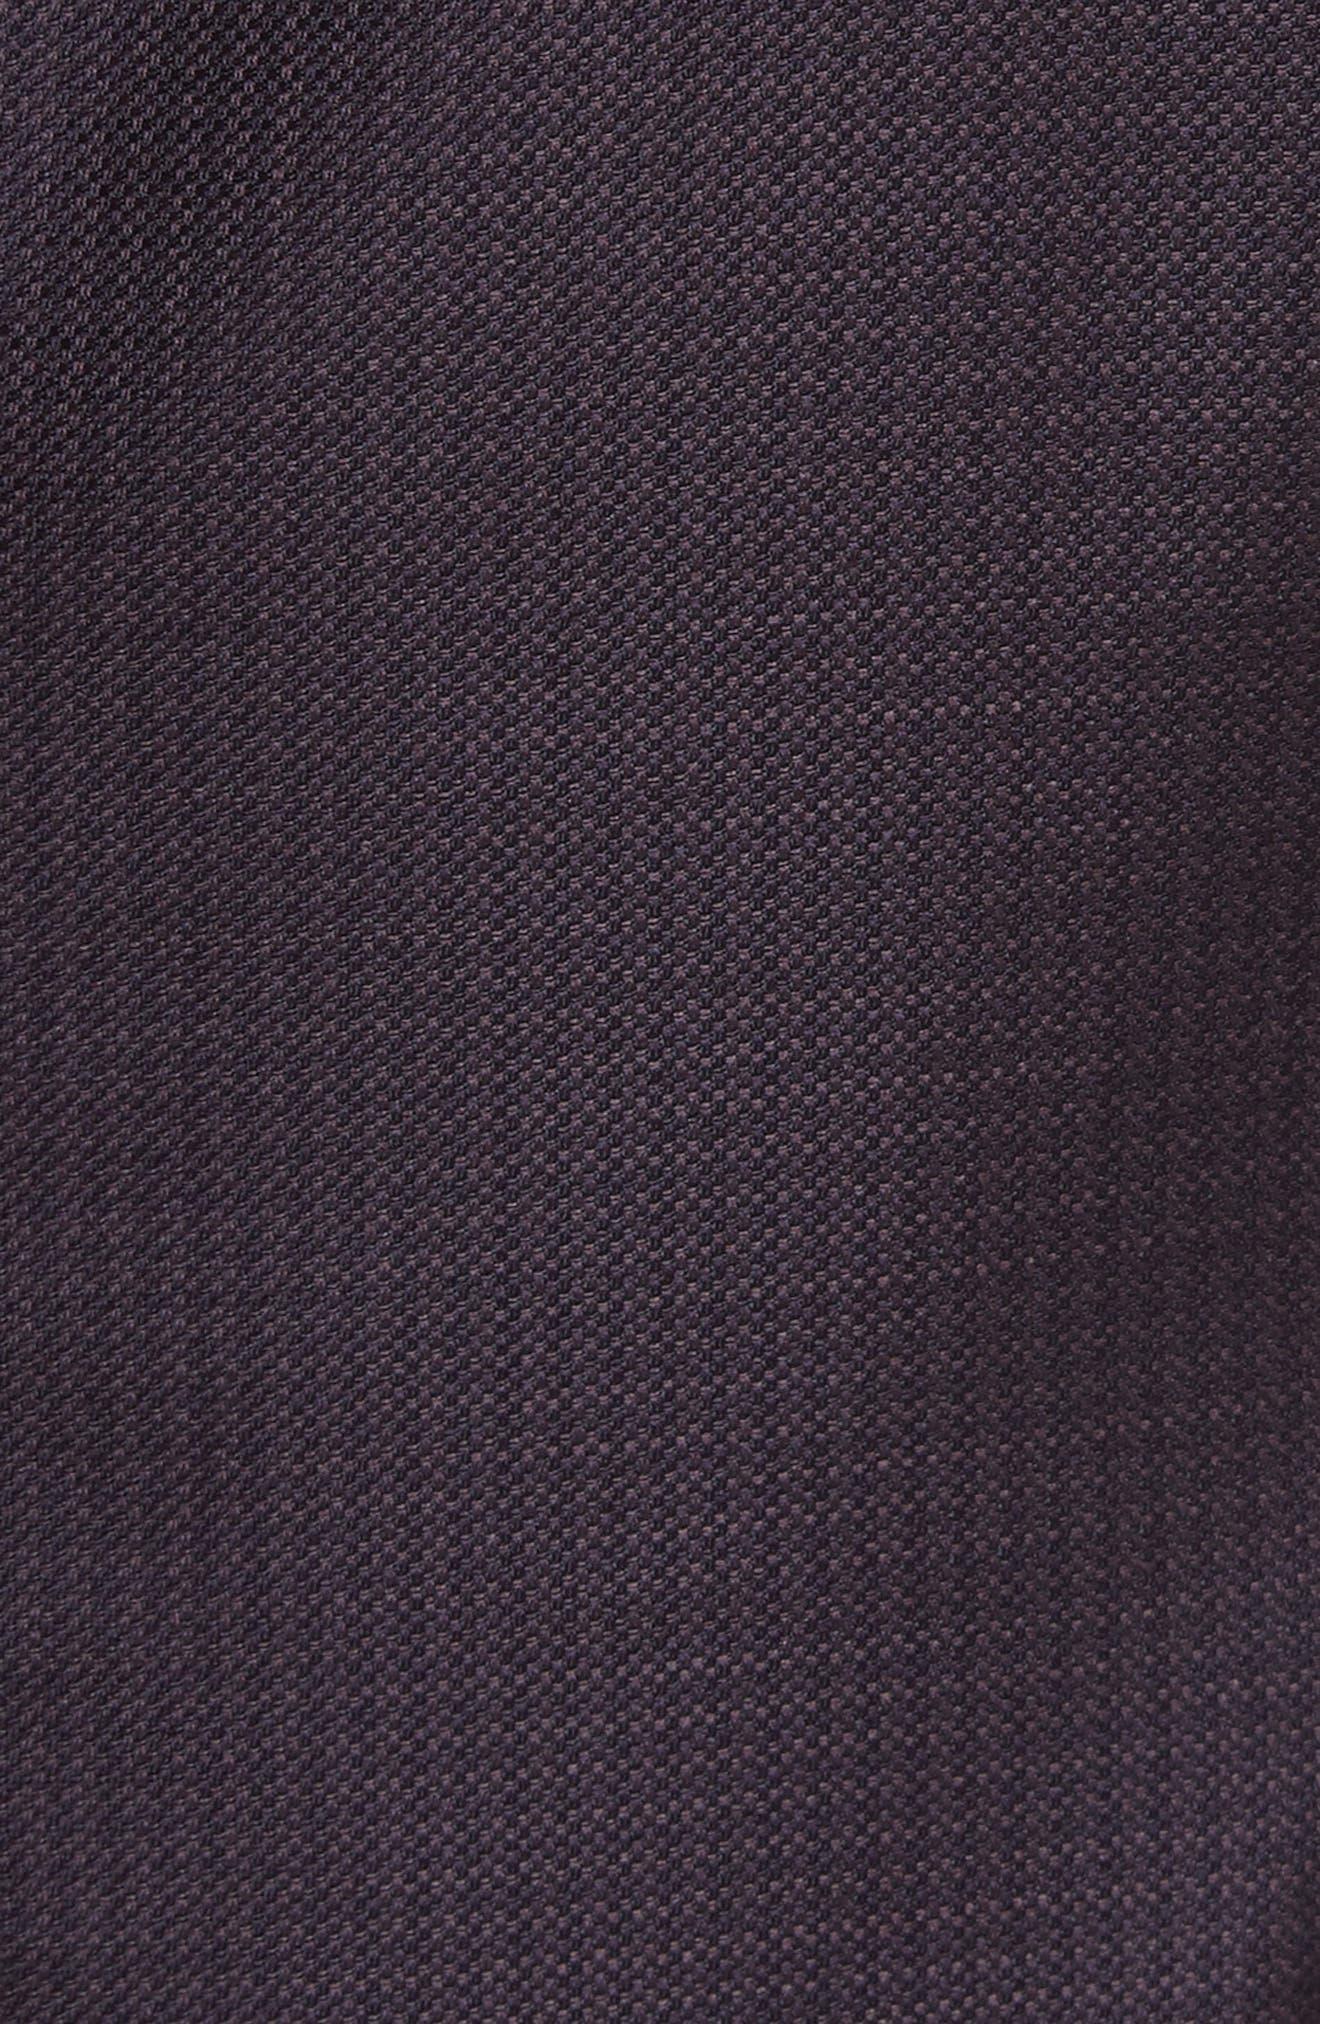 G-Line Trim Fit Houndstooth Wool Sport Coat,                             Alternate thumbnail 5, color,                             604